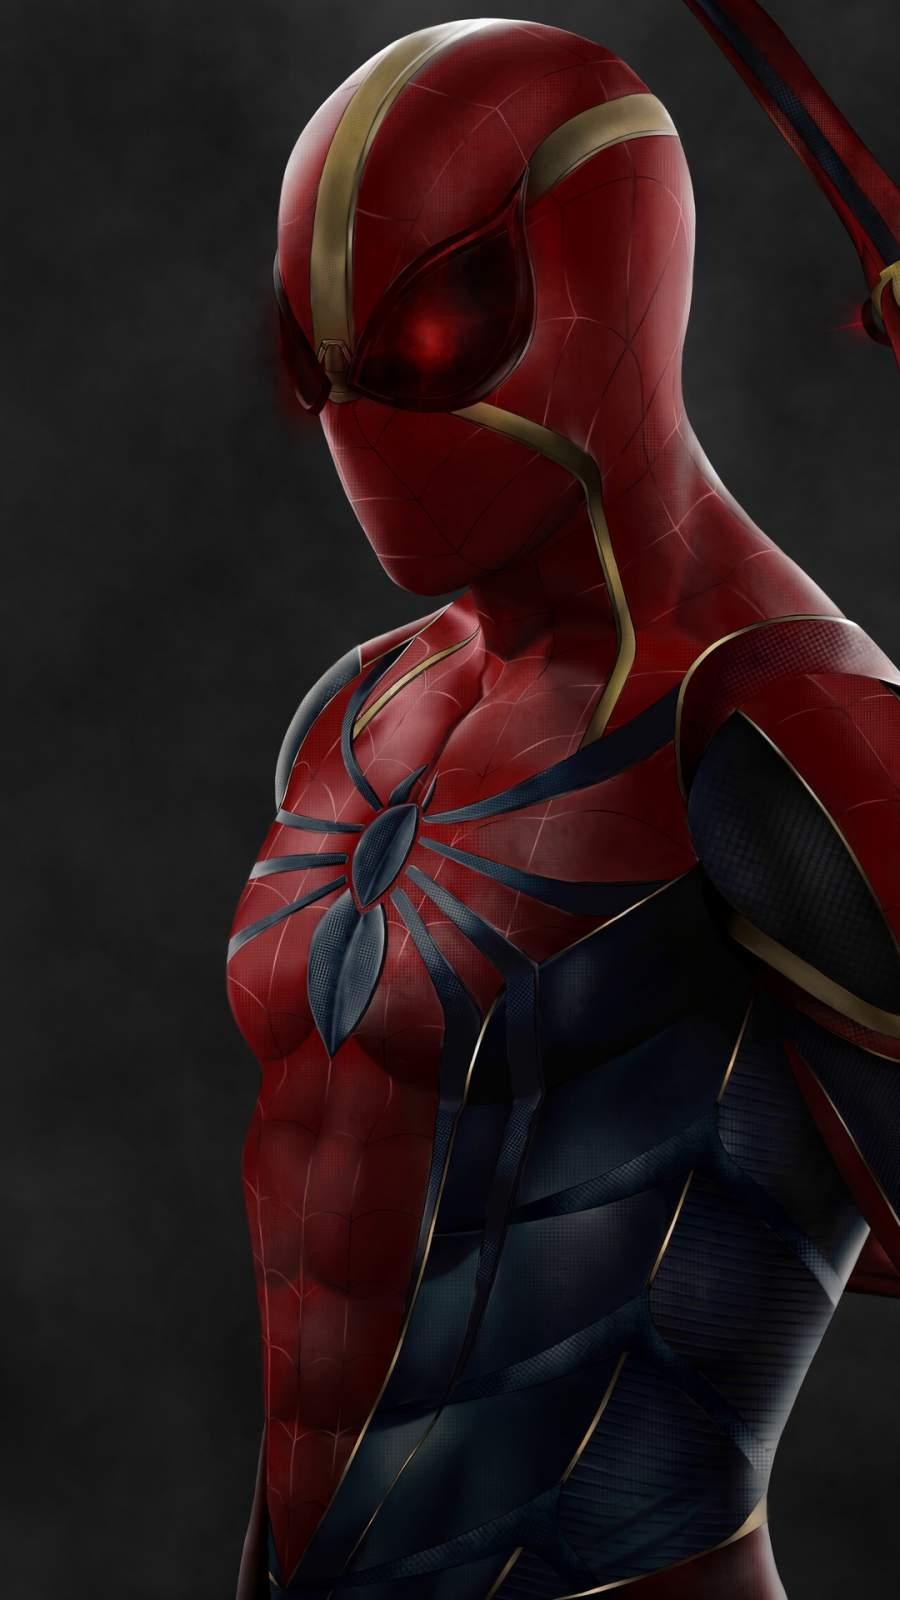 Spiderman Instant Kill Suit iPhone Wallpaper